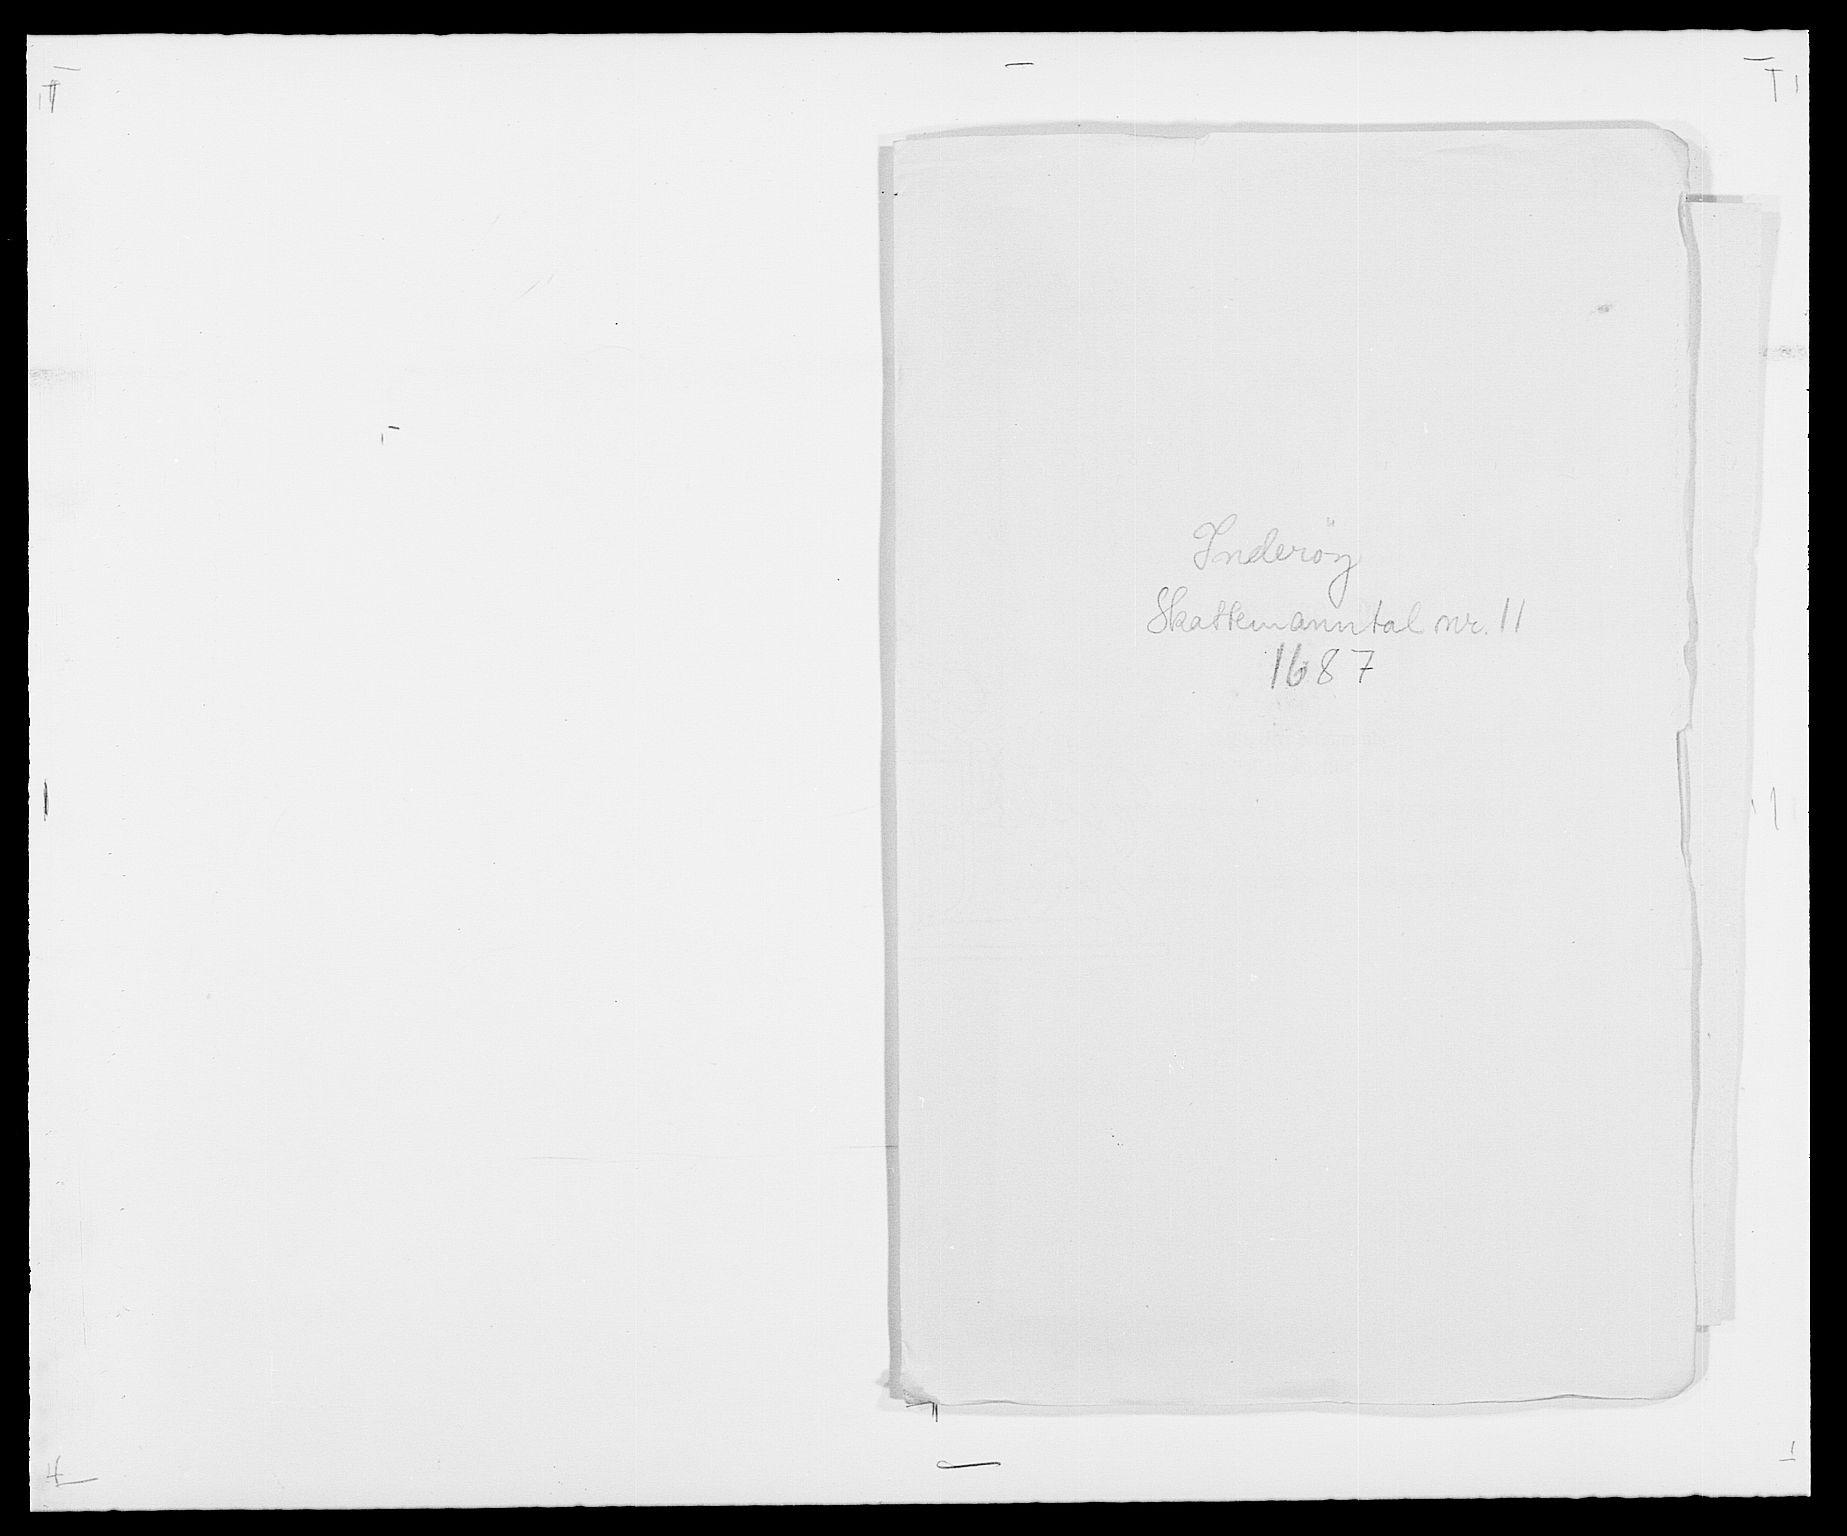 RA, Rentekammeret inntil 1814, Reviderte regnskaper, Fogderegnskap, R63/L4306: Fogderegnskap Inderøy, 1687-1689, s. 222